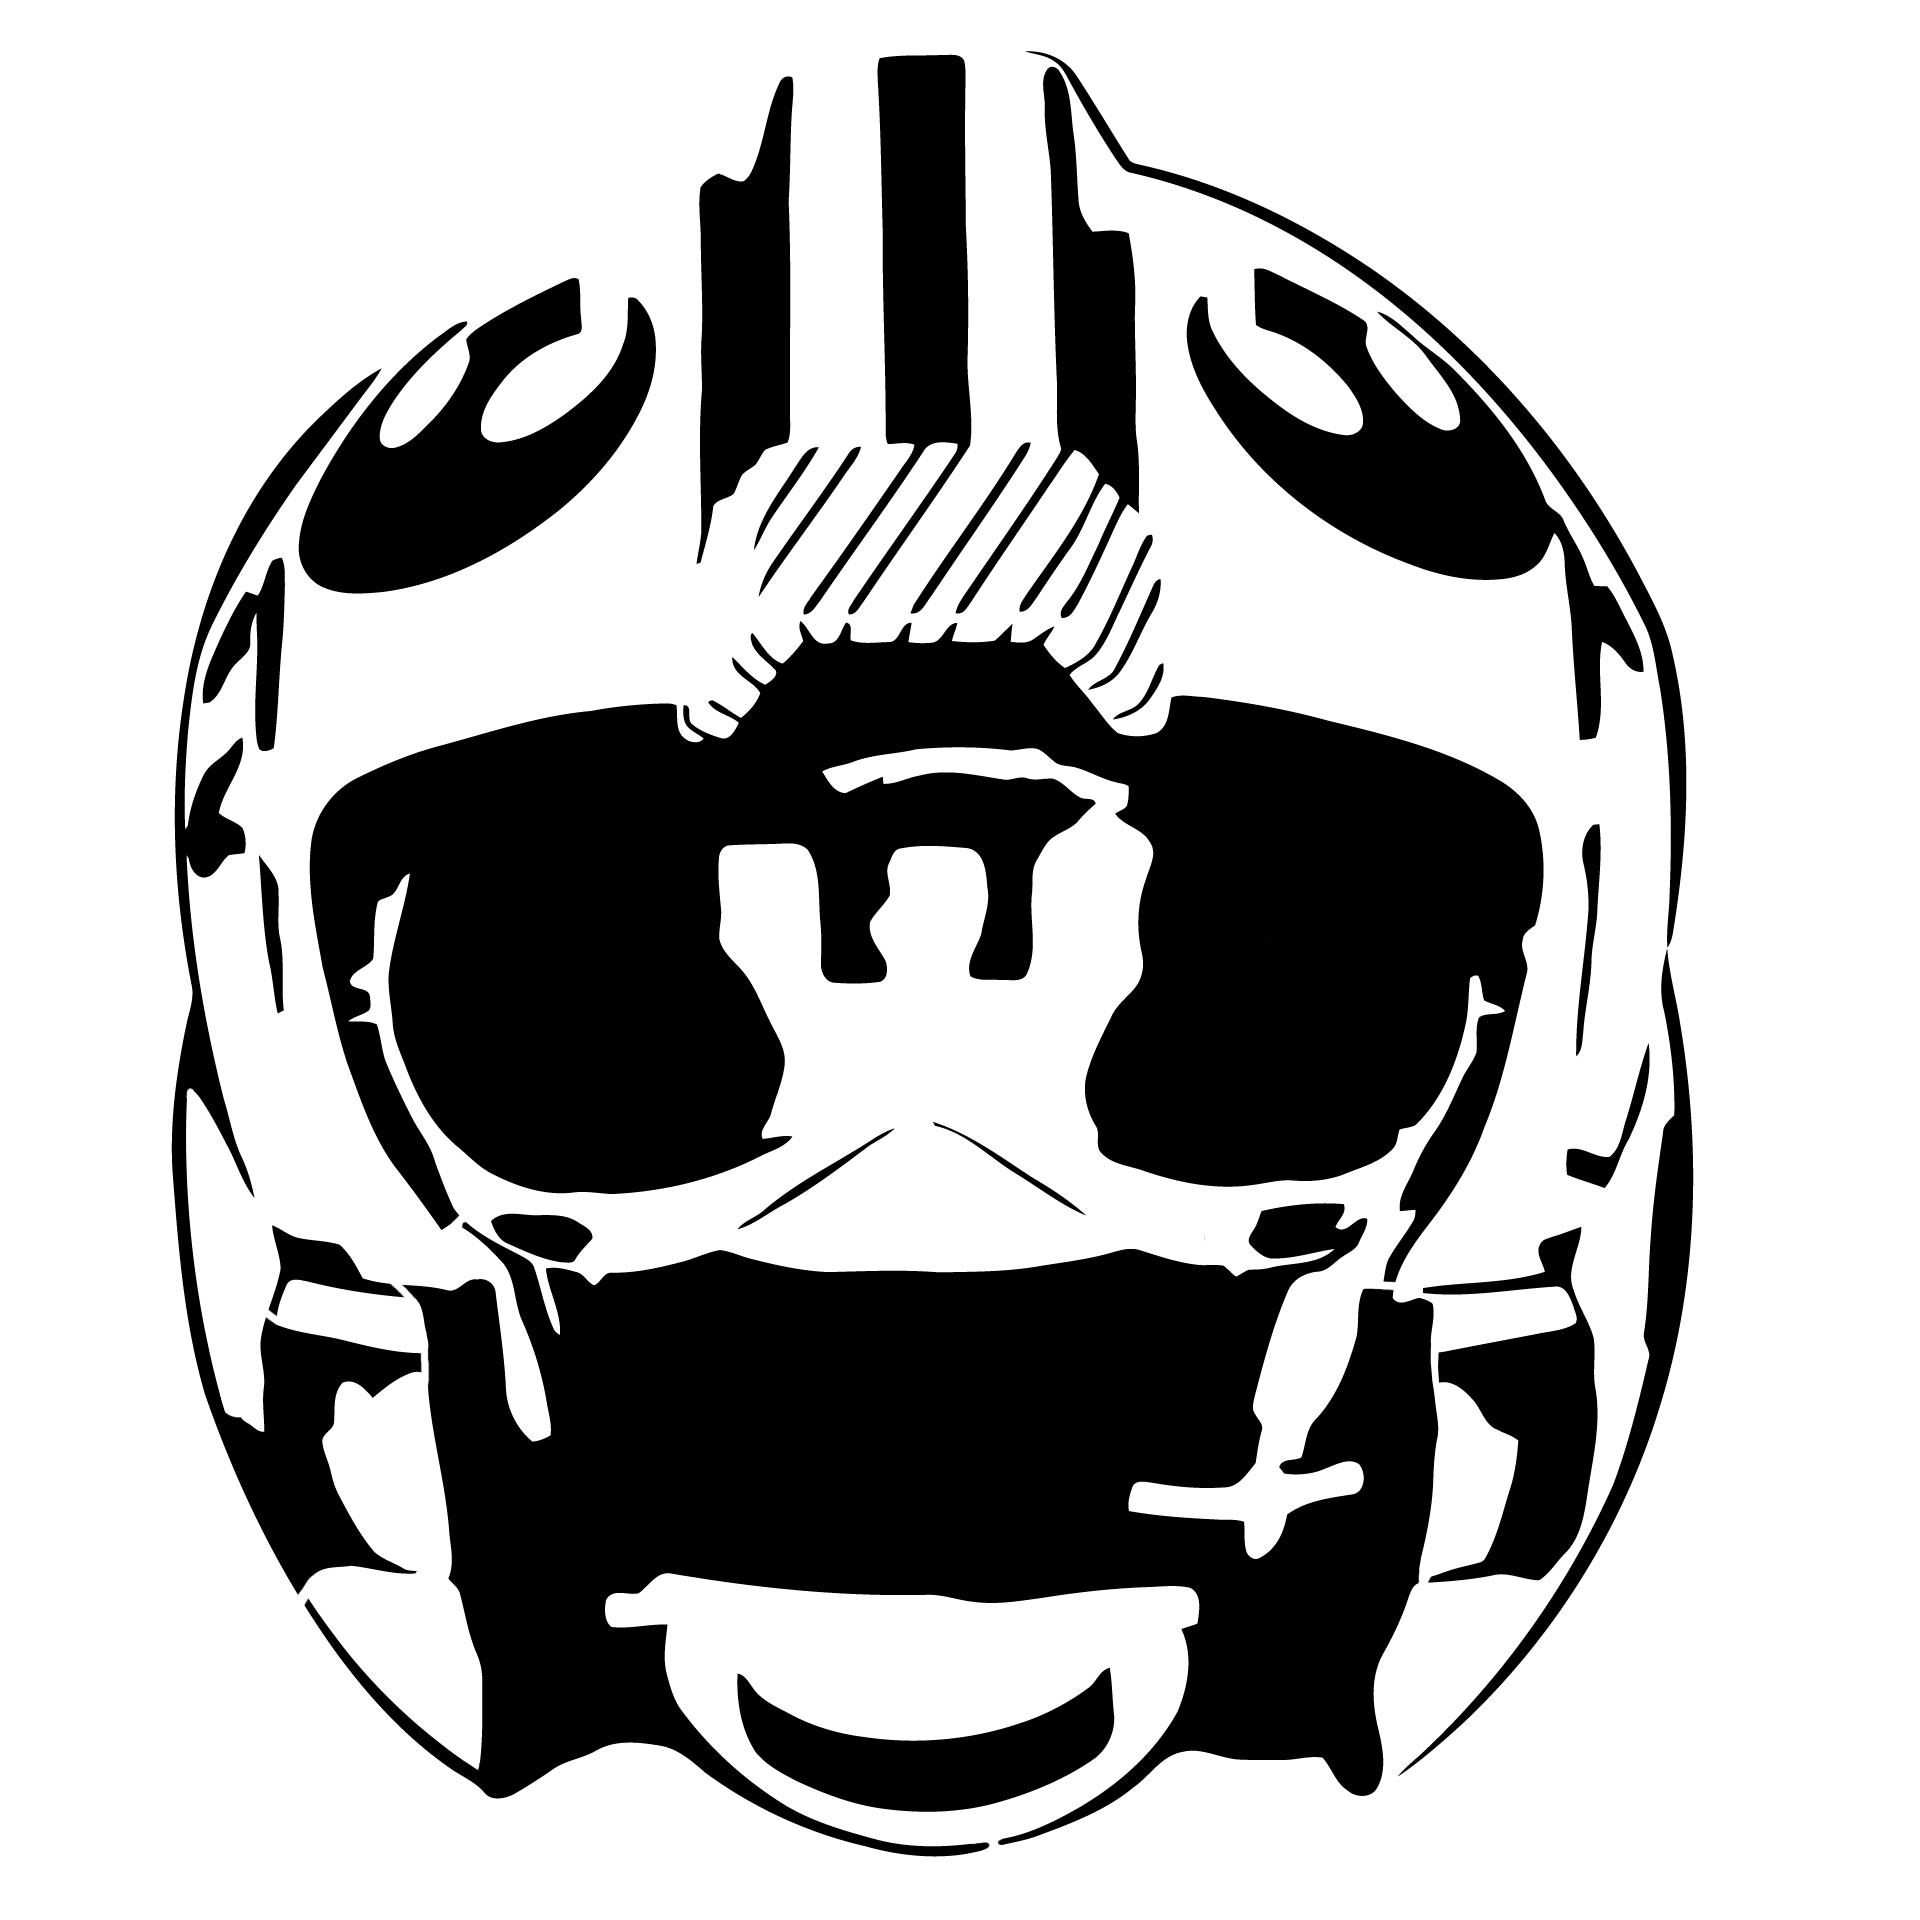 Alliance fighter pilot helmet stencil template Stencil